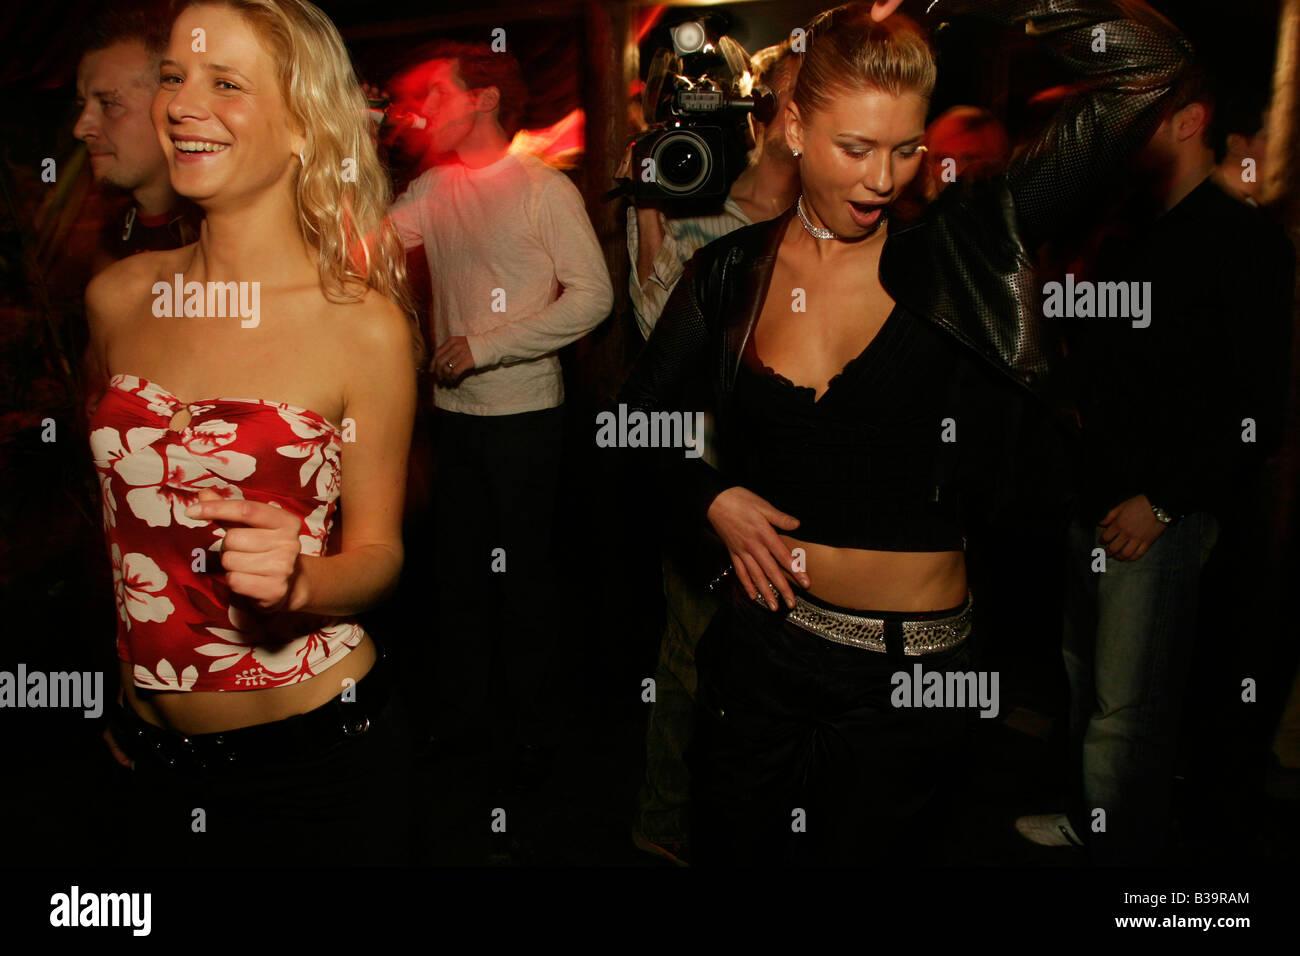 Polish girls at The Cross night club, Kings Cross, London. Stock Photo